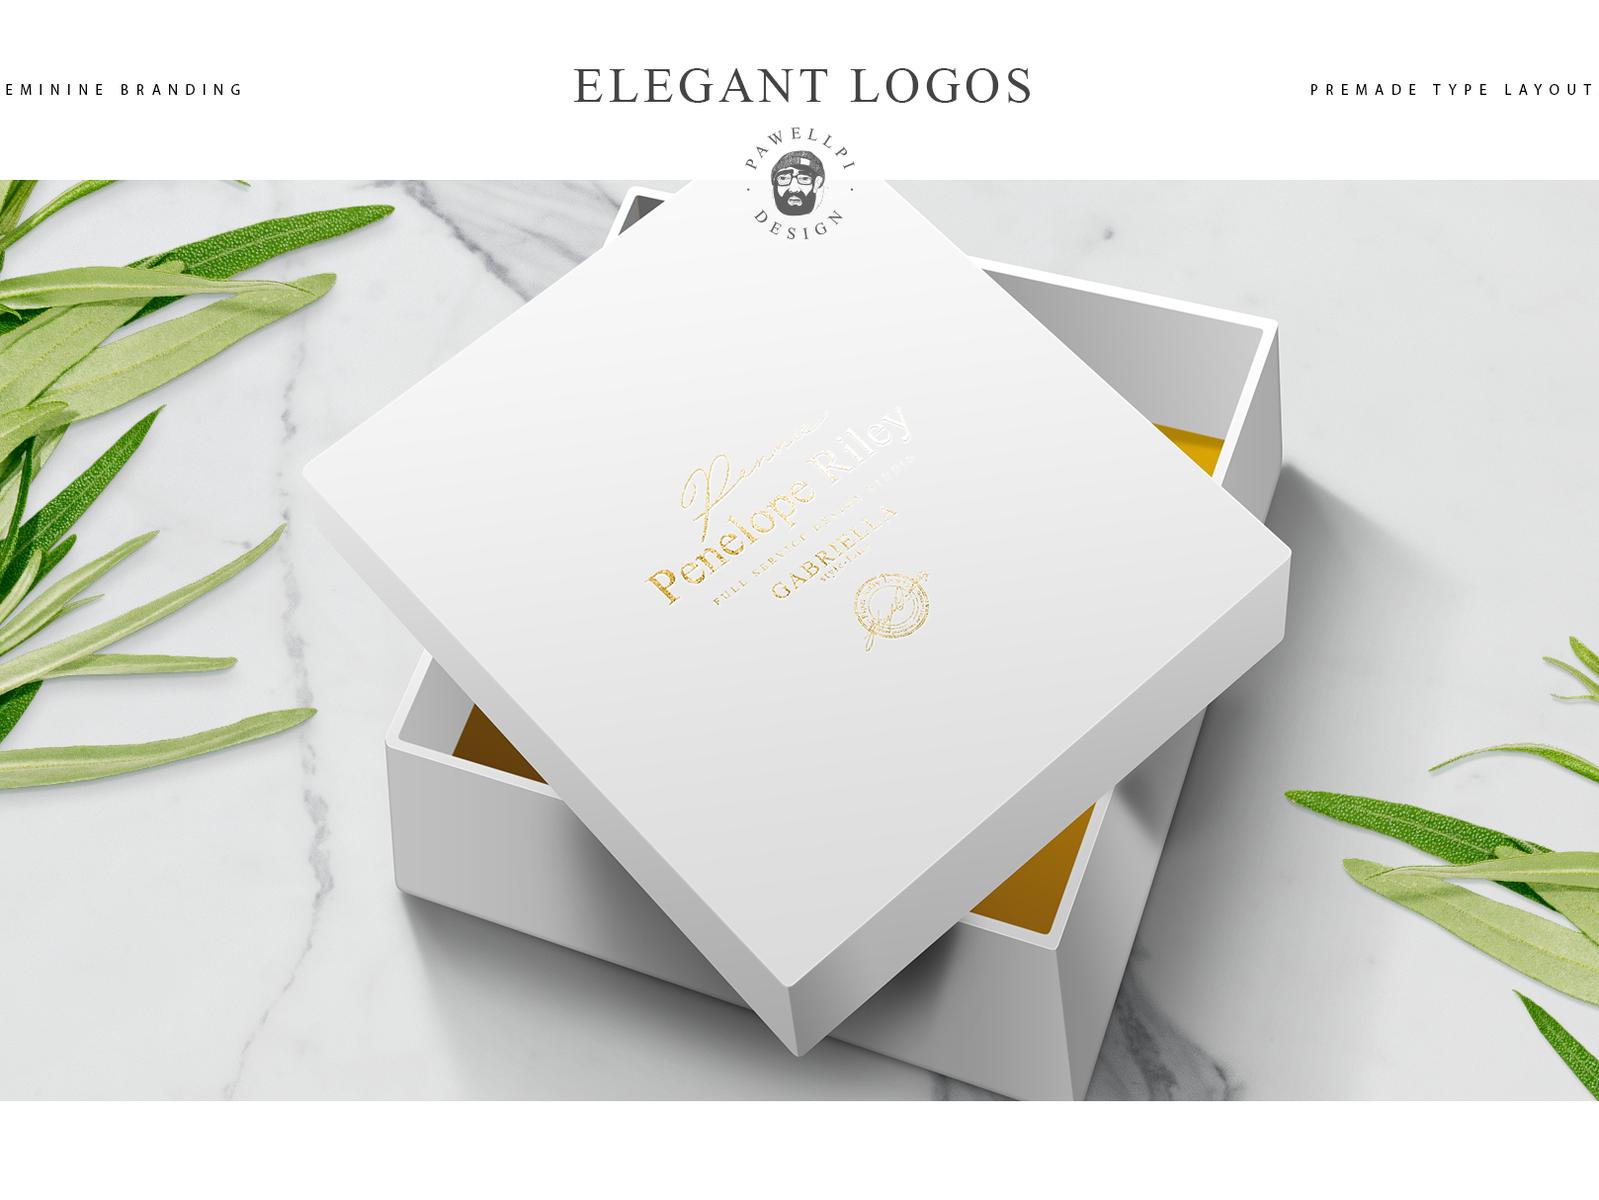 Elegant Premade Logo Templates By Pawellpi Design Dribbble - Logo layout templates